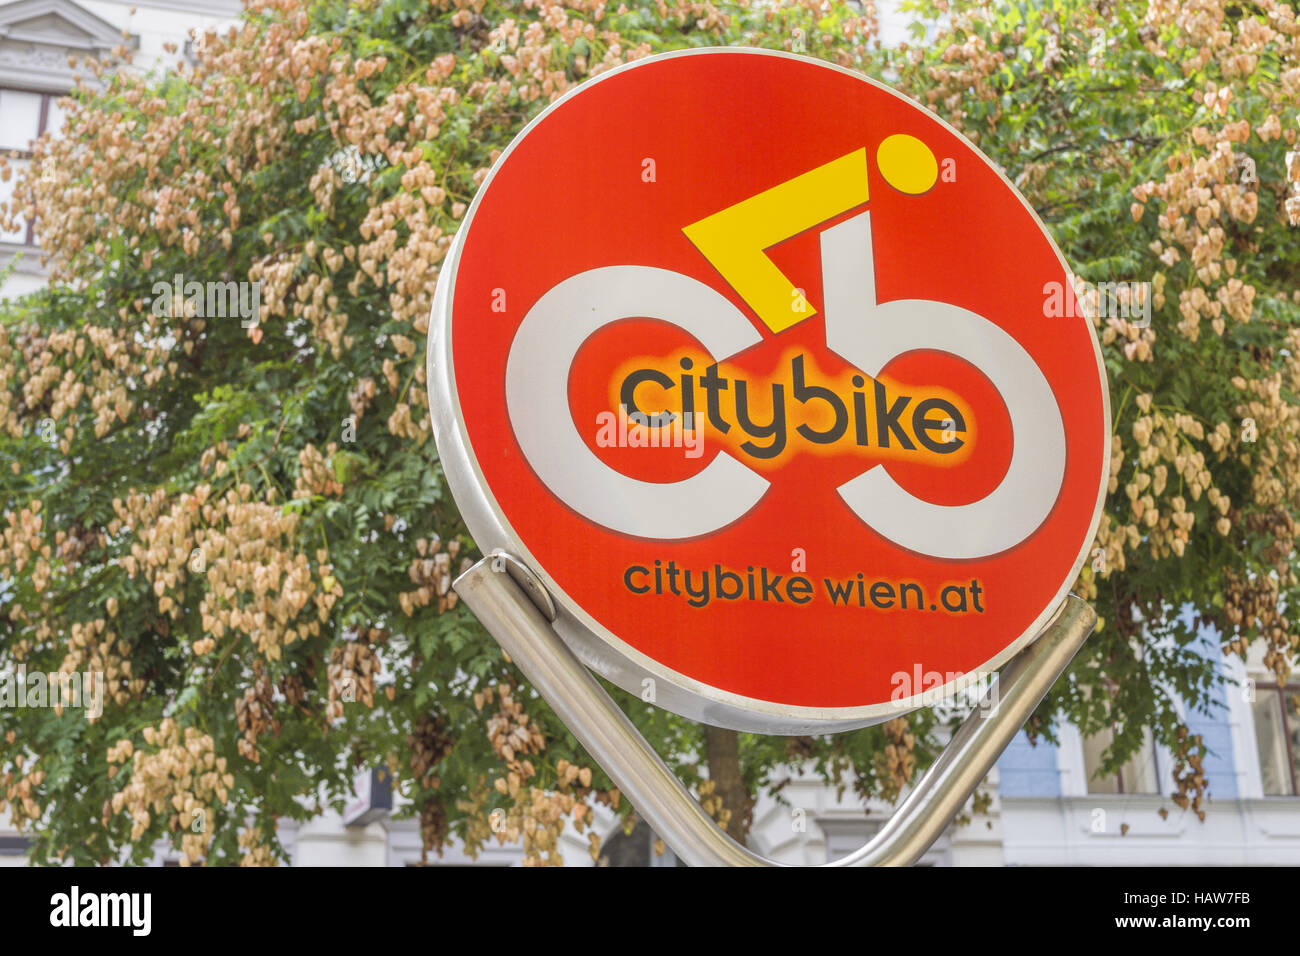 citybike, logo Stock Photo